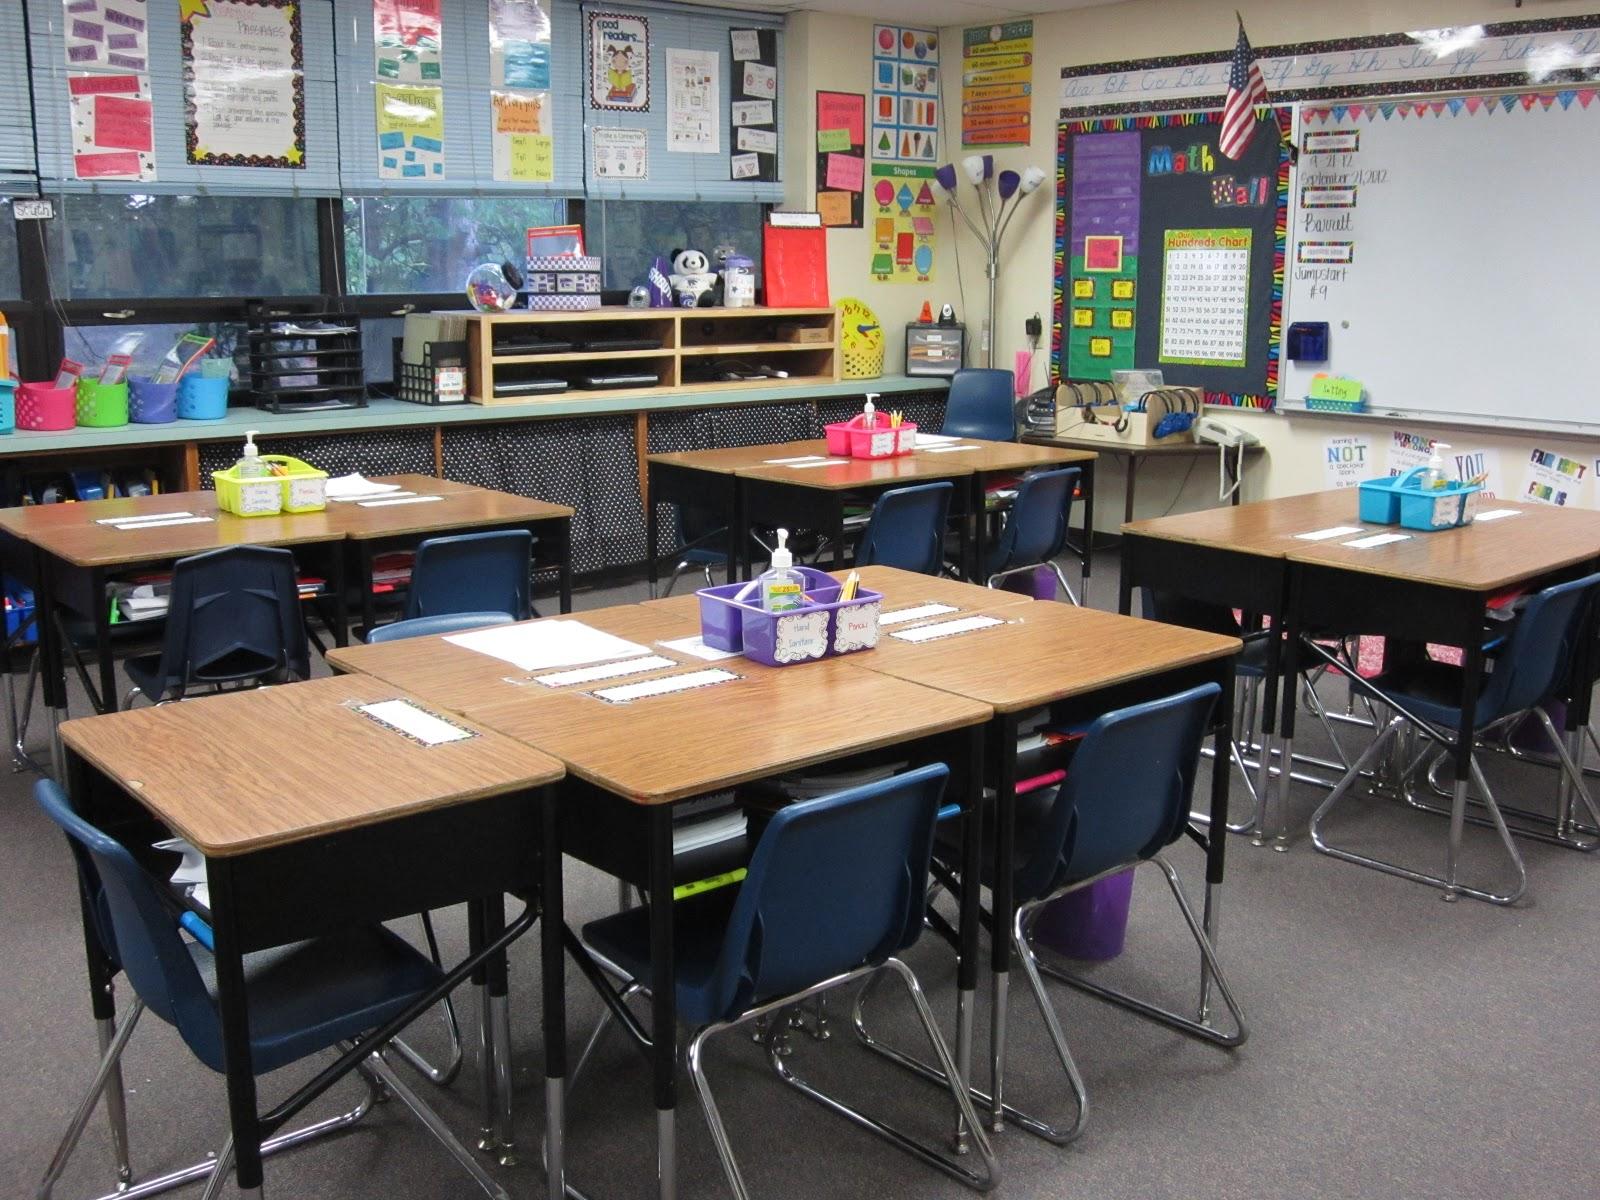 Third grade rock star classroom sneak peek table - Classroom desk organization ...